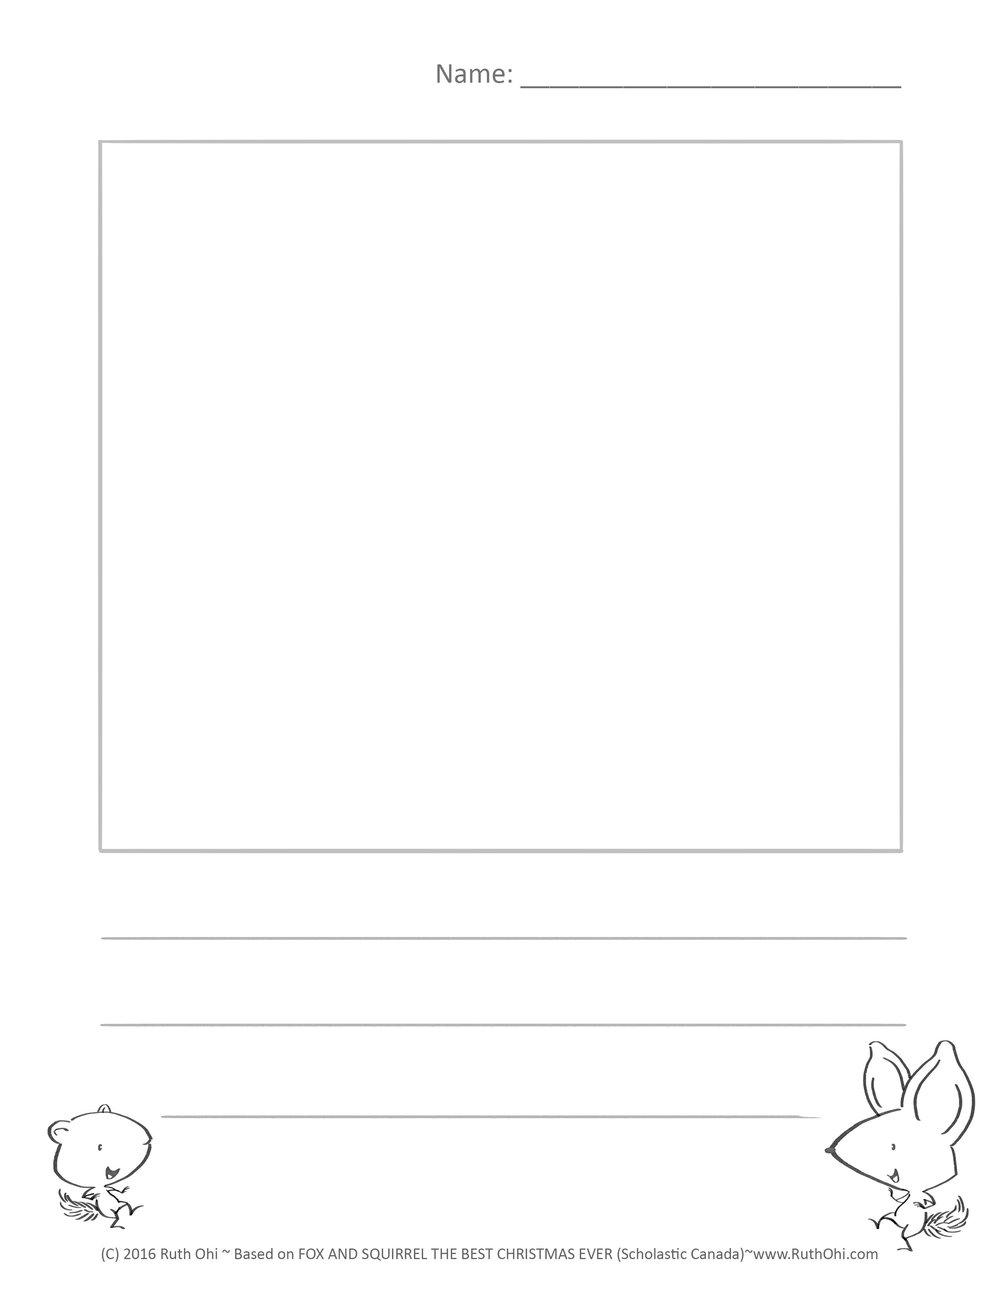 160822 FSX lines w bw fsx image in corners.jpg